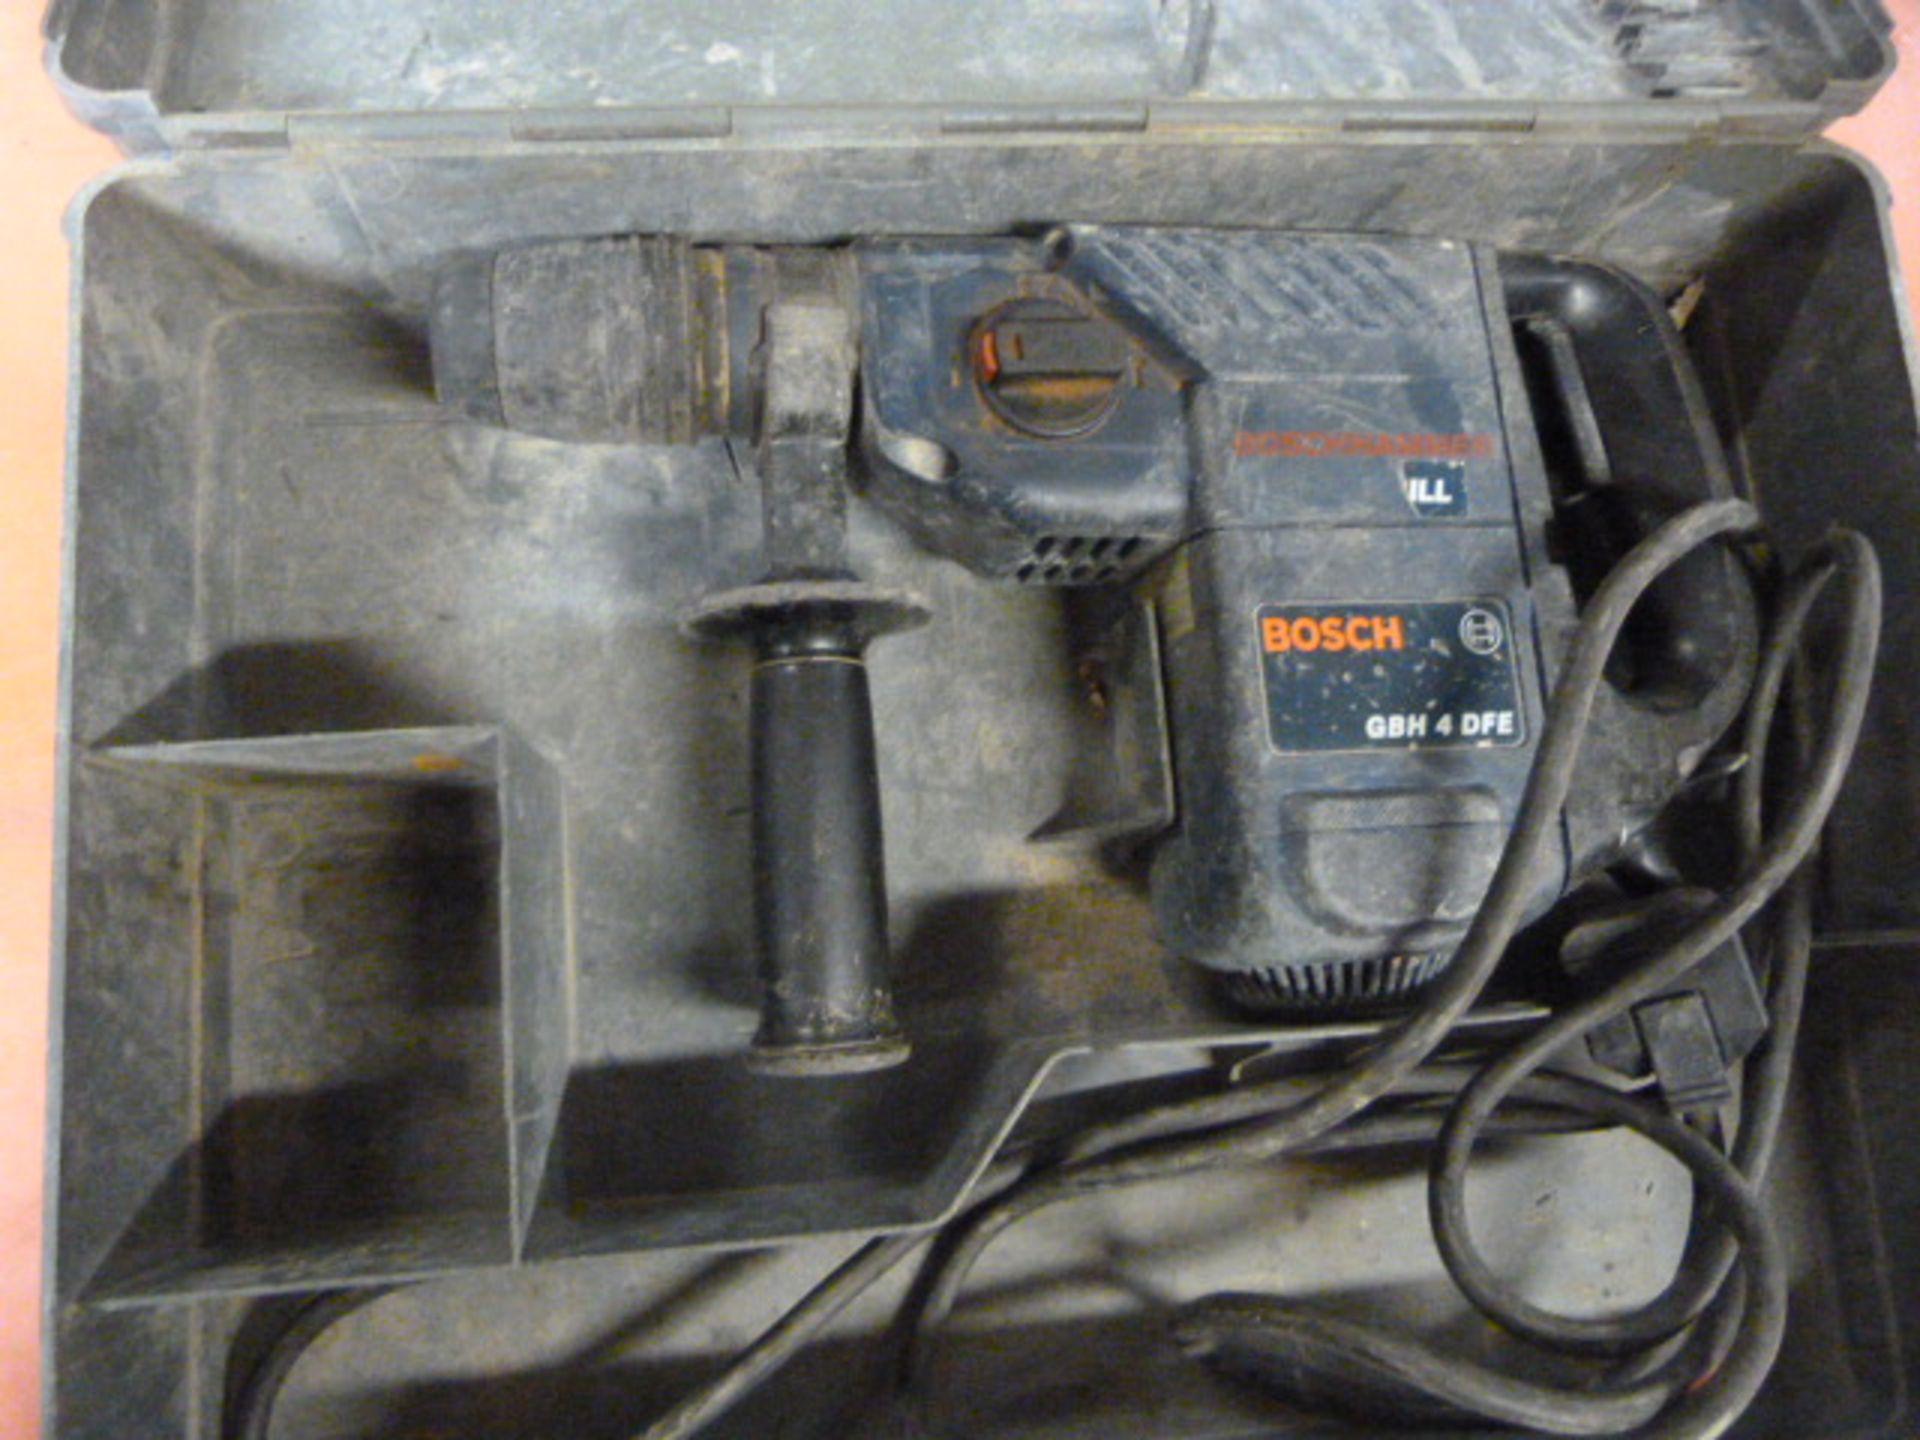 Lot 472 - Bosch GBH4DFE Hammer Drill